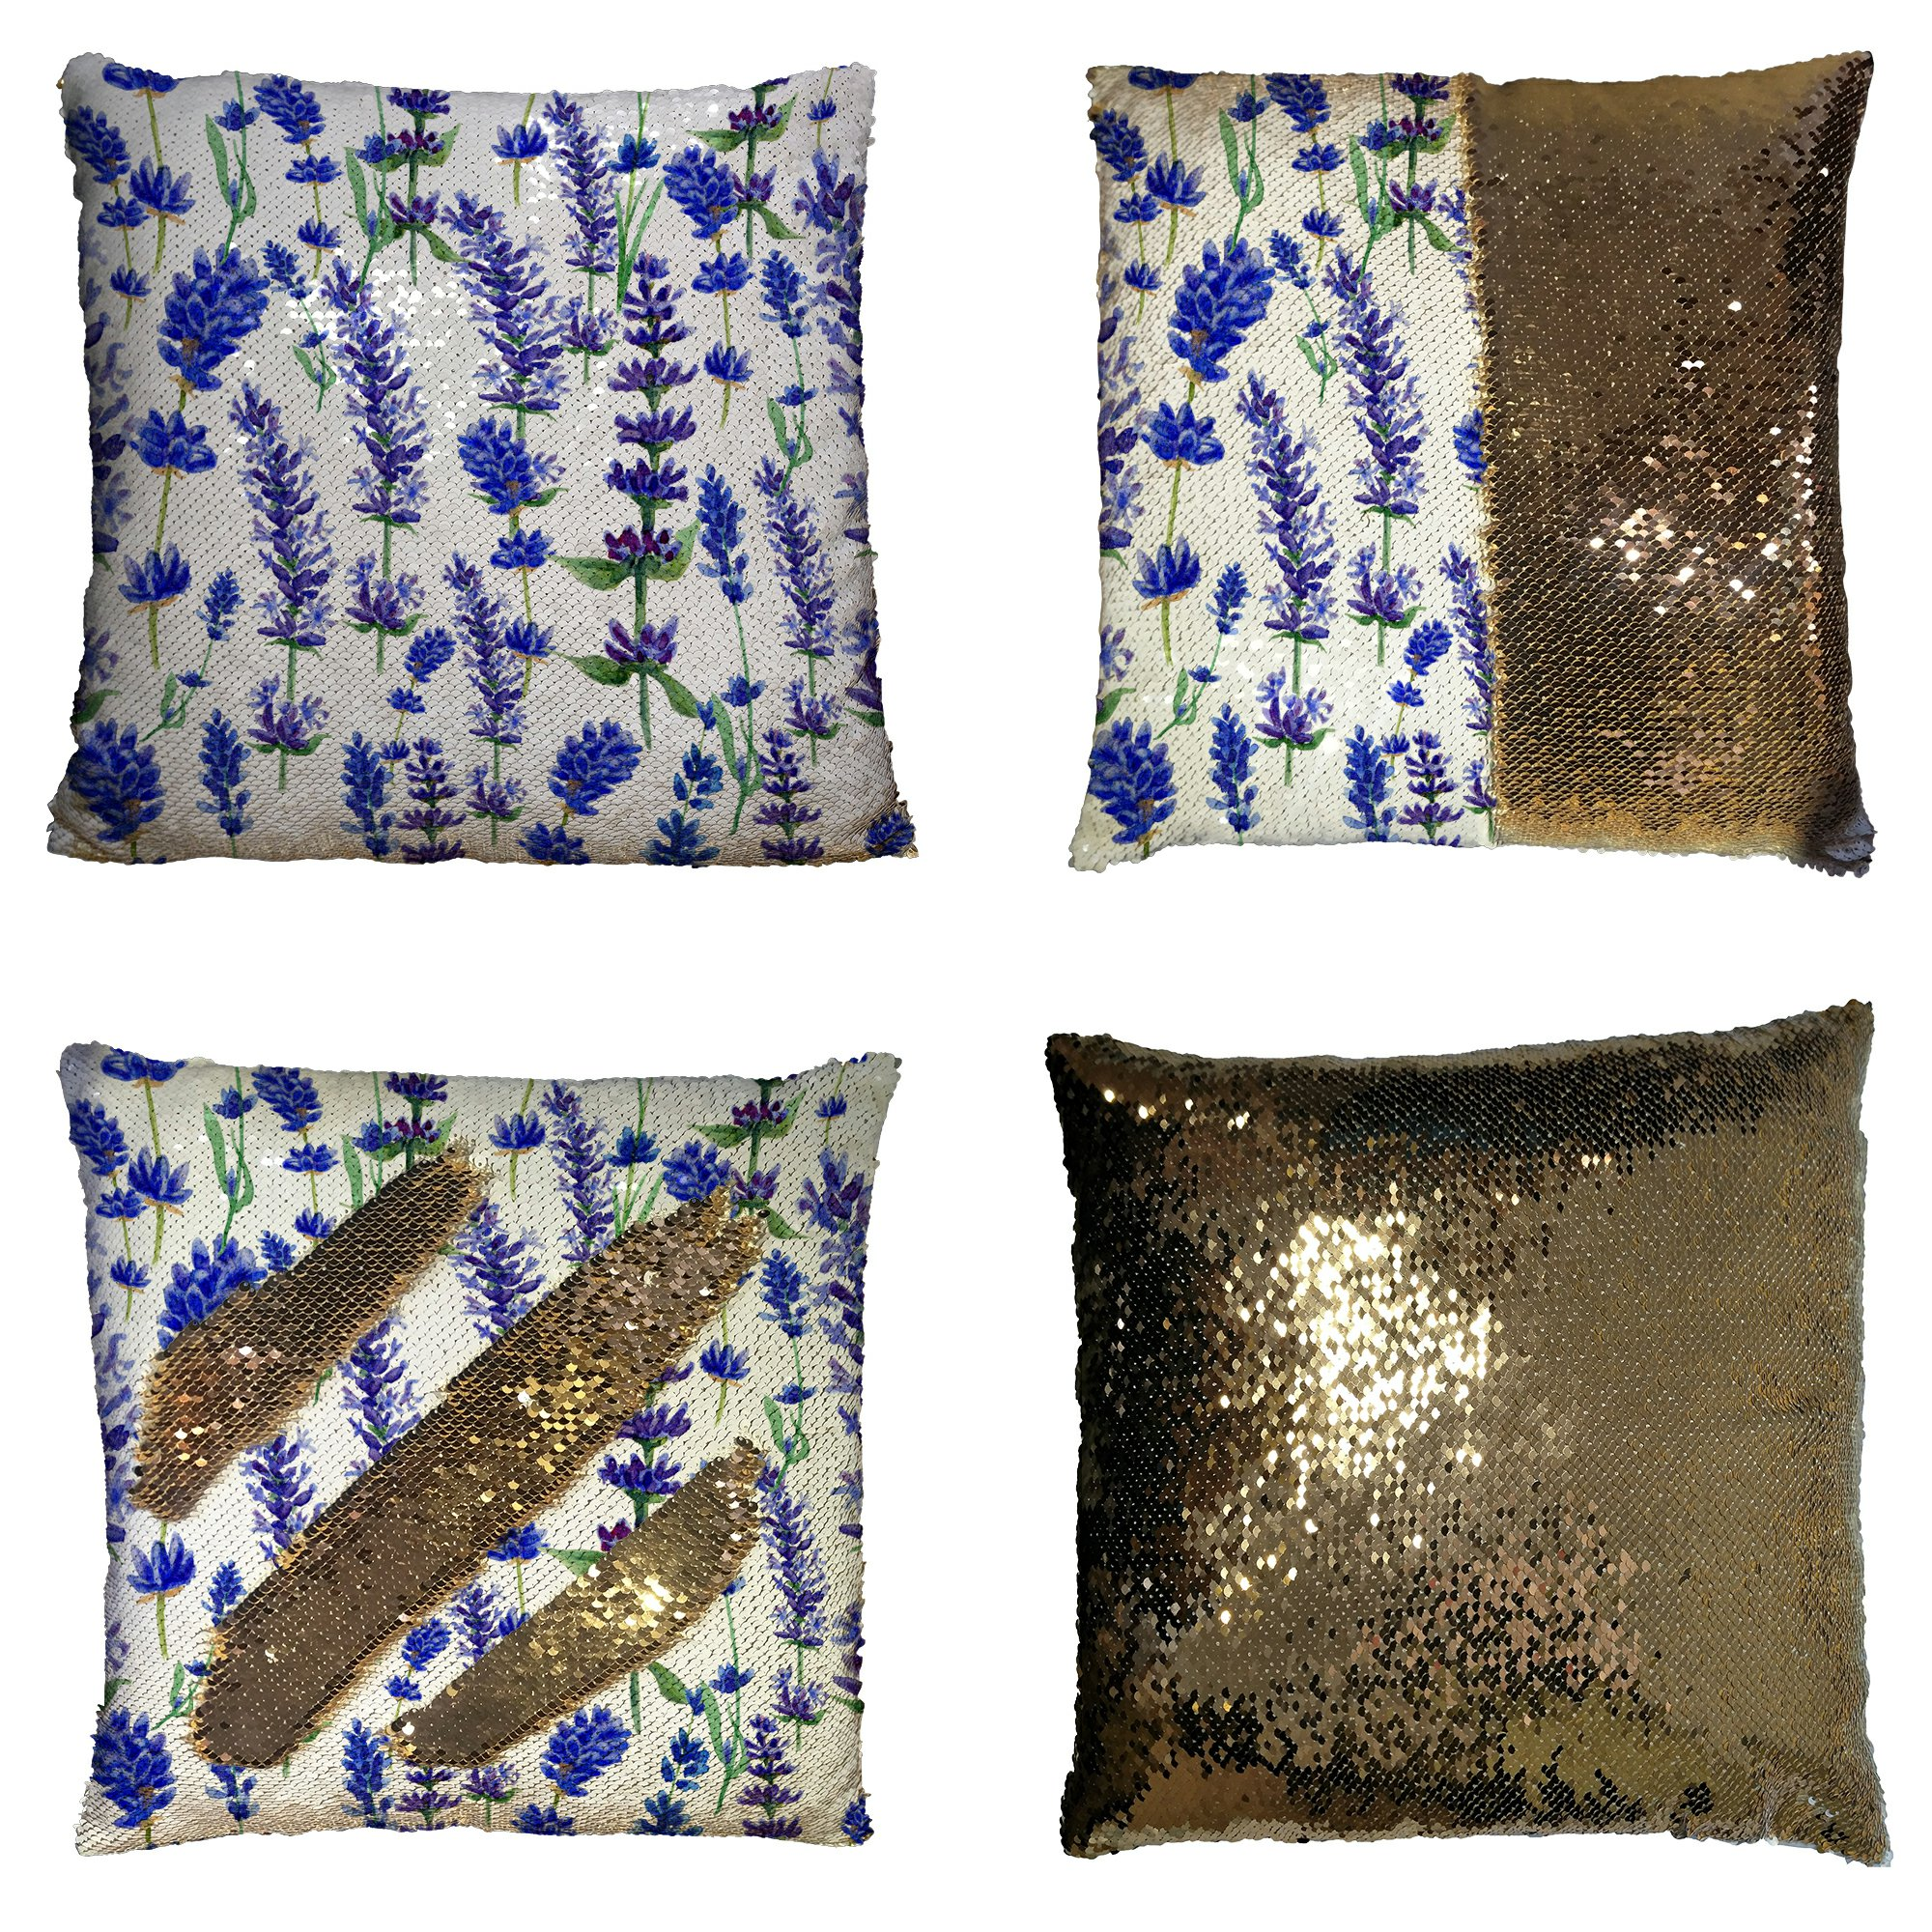 GCKG Purple Flower Floral Pillowcase, Watercolor Lavender Seamless Pattern Reversible Mermaid Sequin Pillow Case Home Decor Cushion Cover 16x16 inches